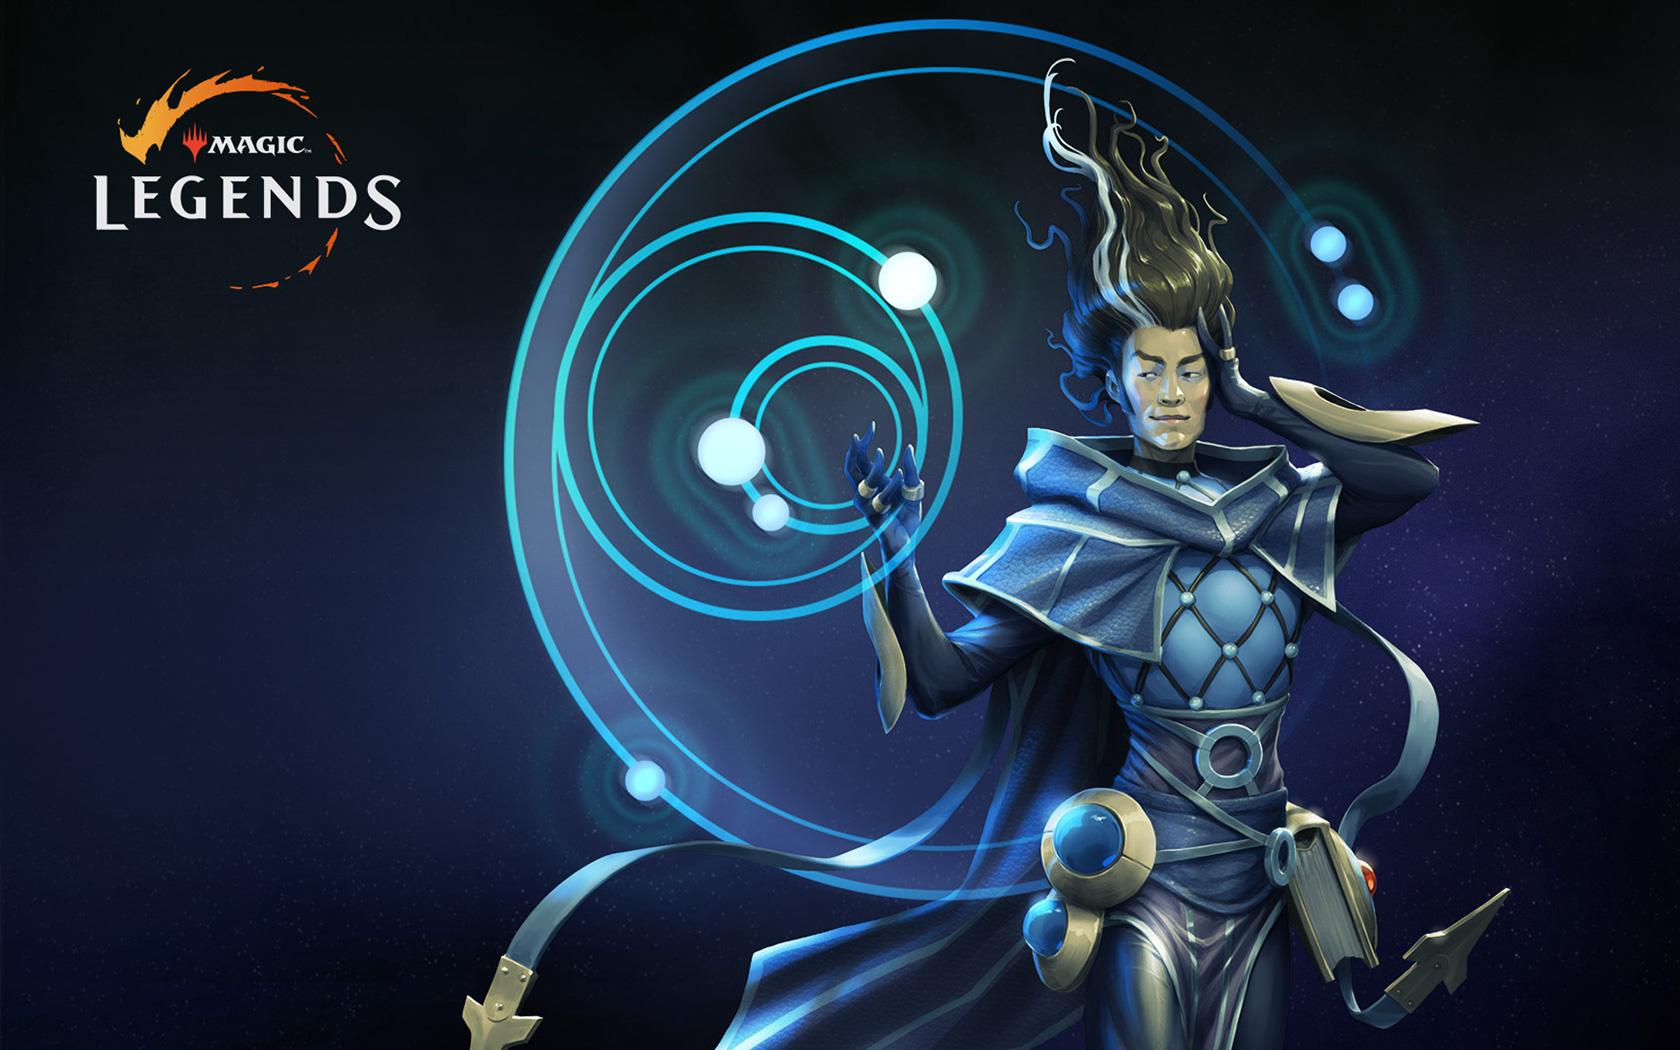 Free Magic: Legends Wallpaper in 1680x1050